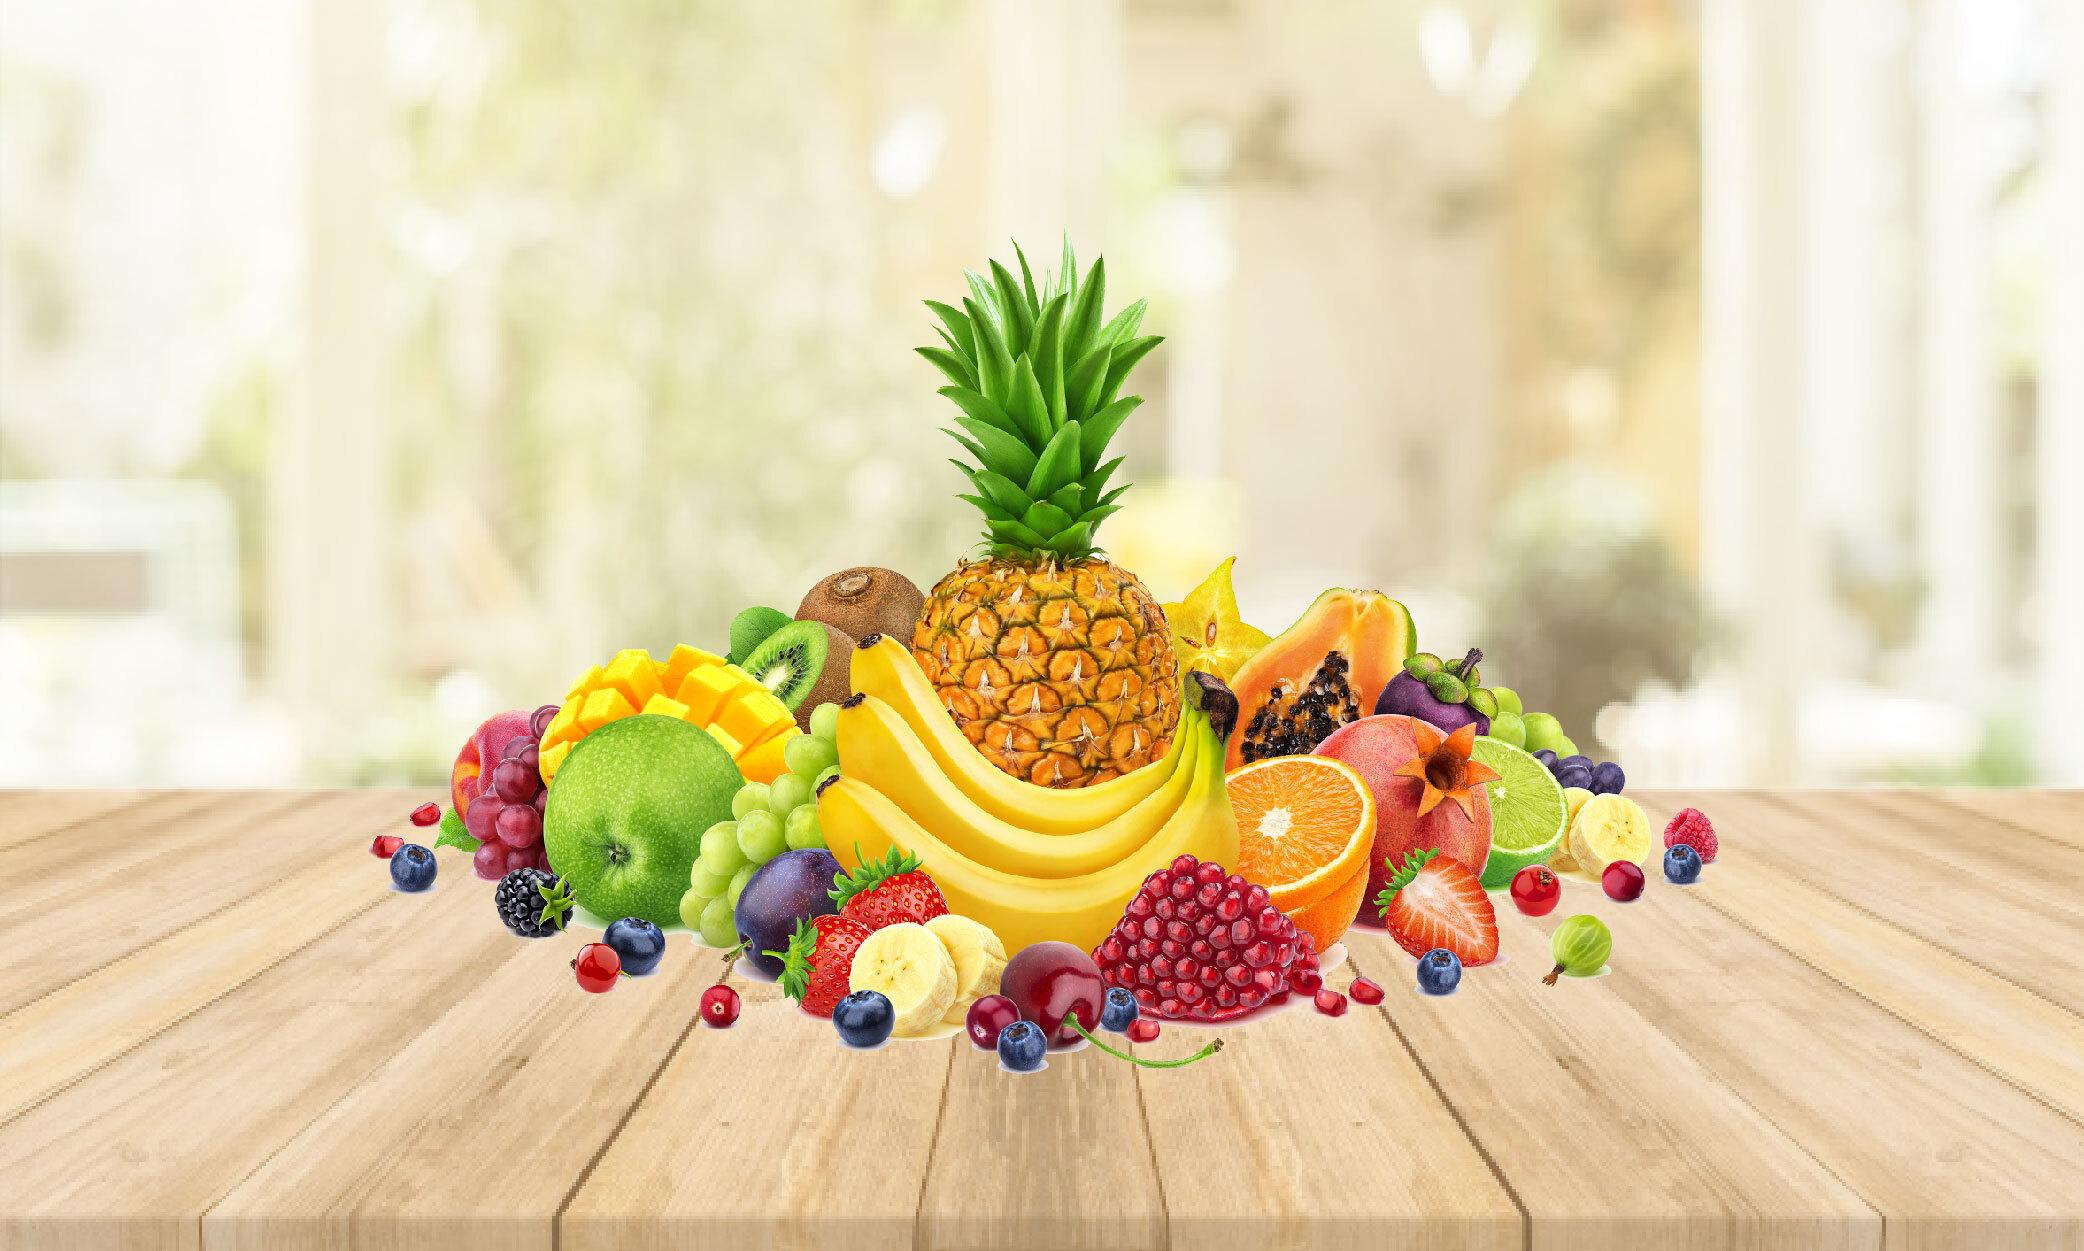 Fruits & Berries Help Prevent Alzheimer's Disease